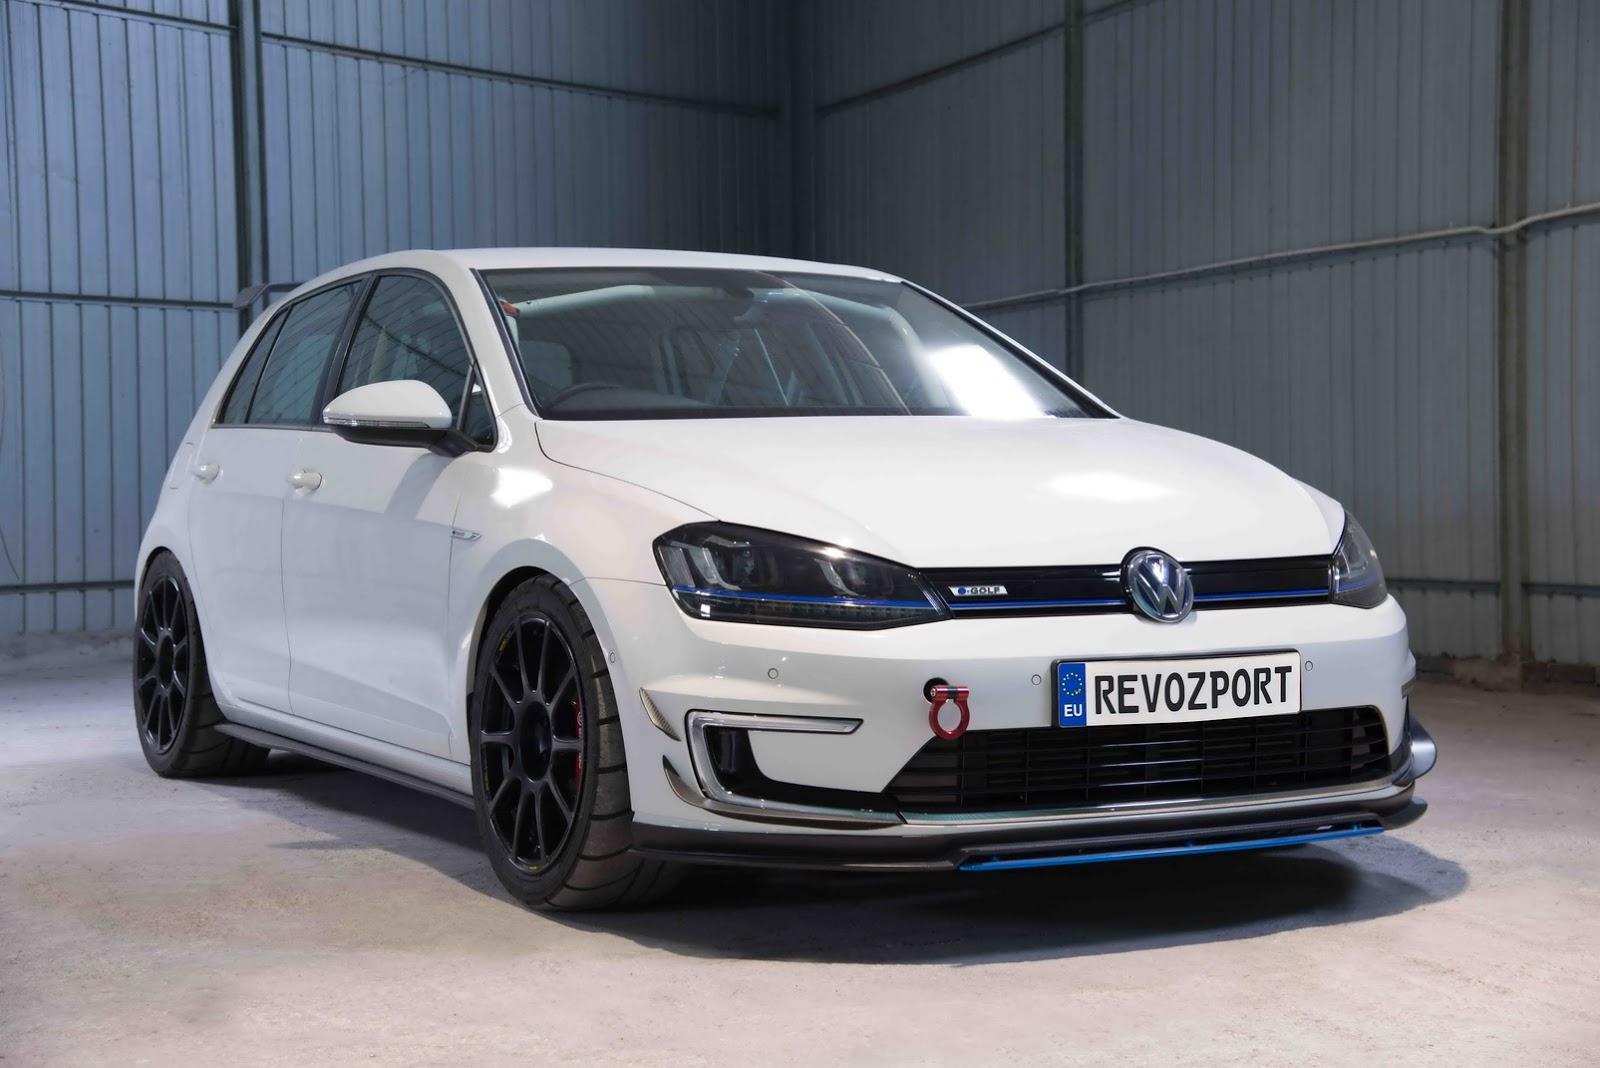 Volkswagen_e-Golf_Razor_7E_by_RevoZport_11